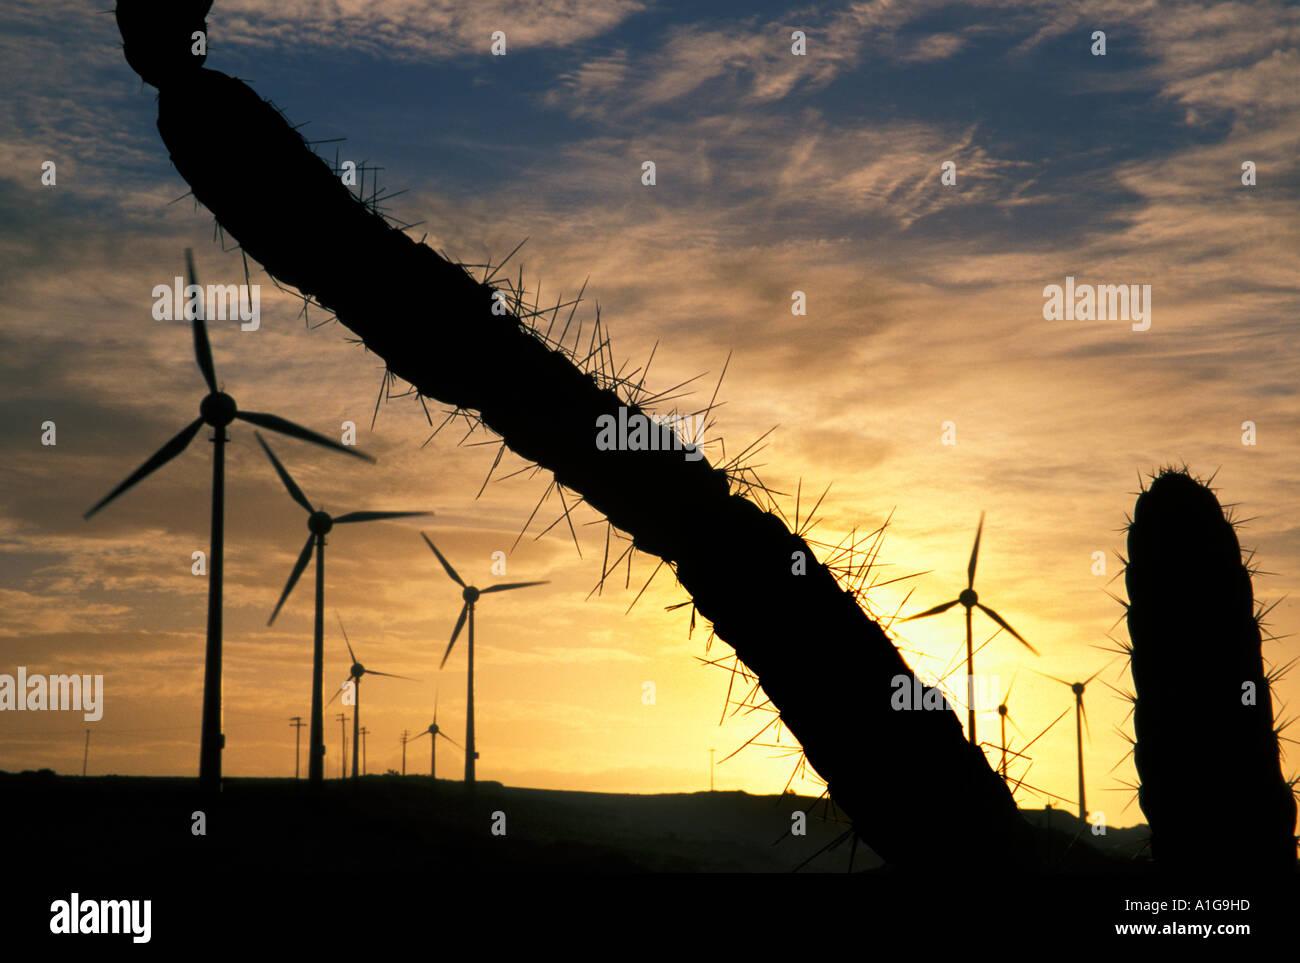 Eolian energy: wind farm 10 MW  at sunset among xerophytic vegetation with cactus near Fortaleza, Ceara, Brazil - Stock Image